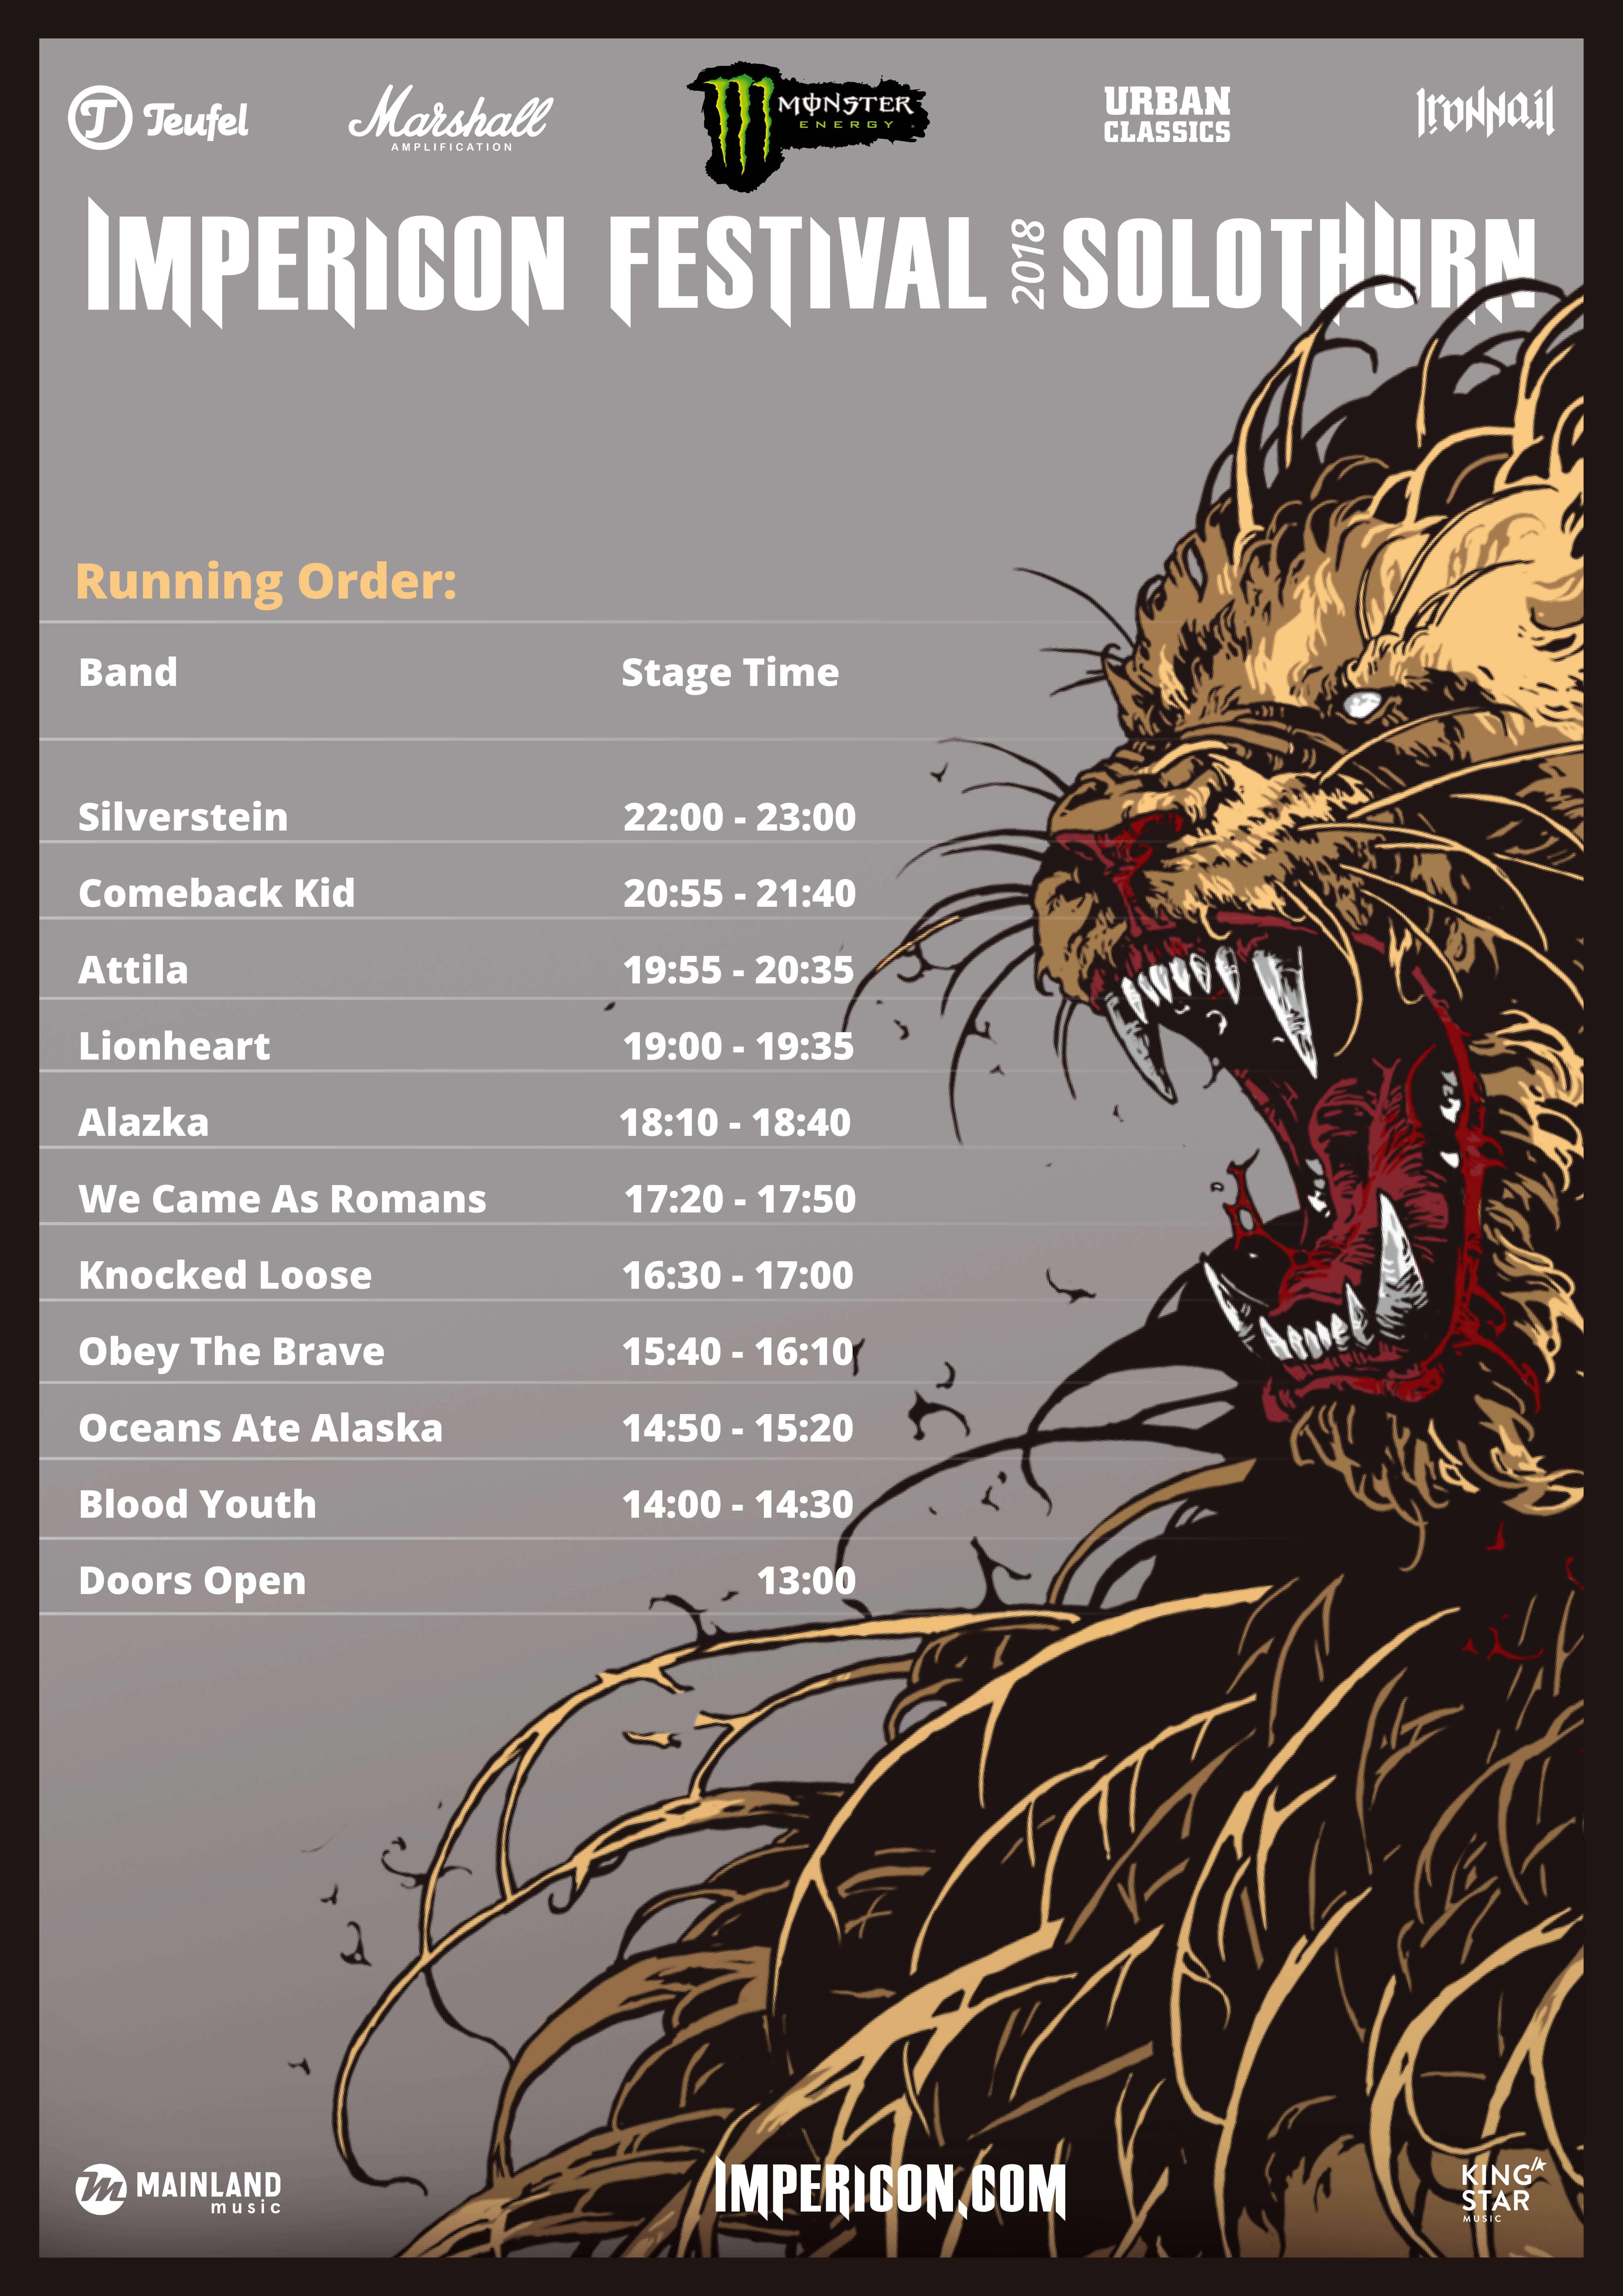 Running Order Impericon Festival Solothurn